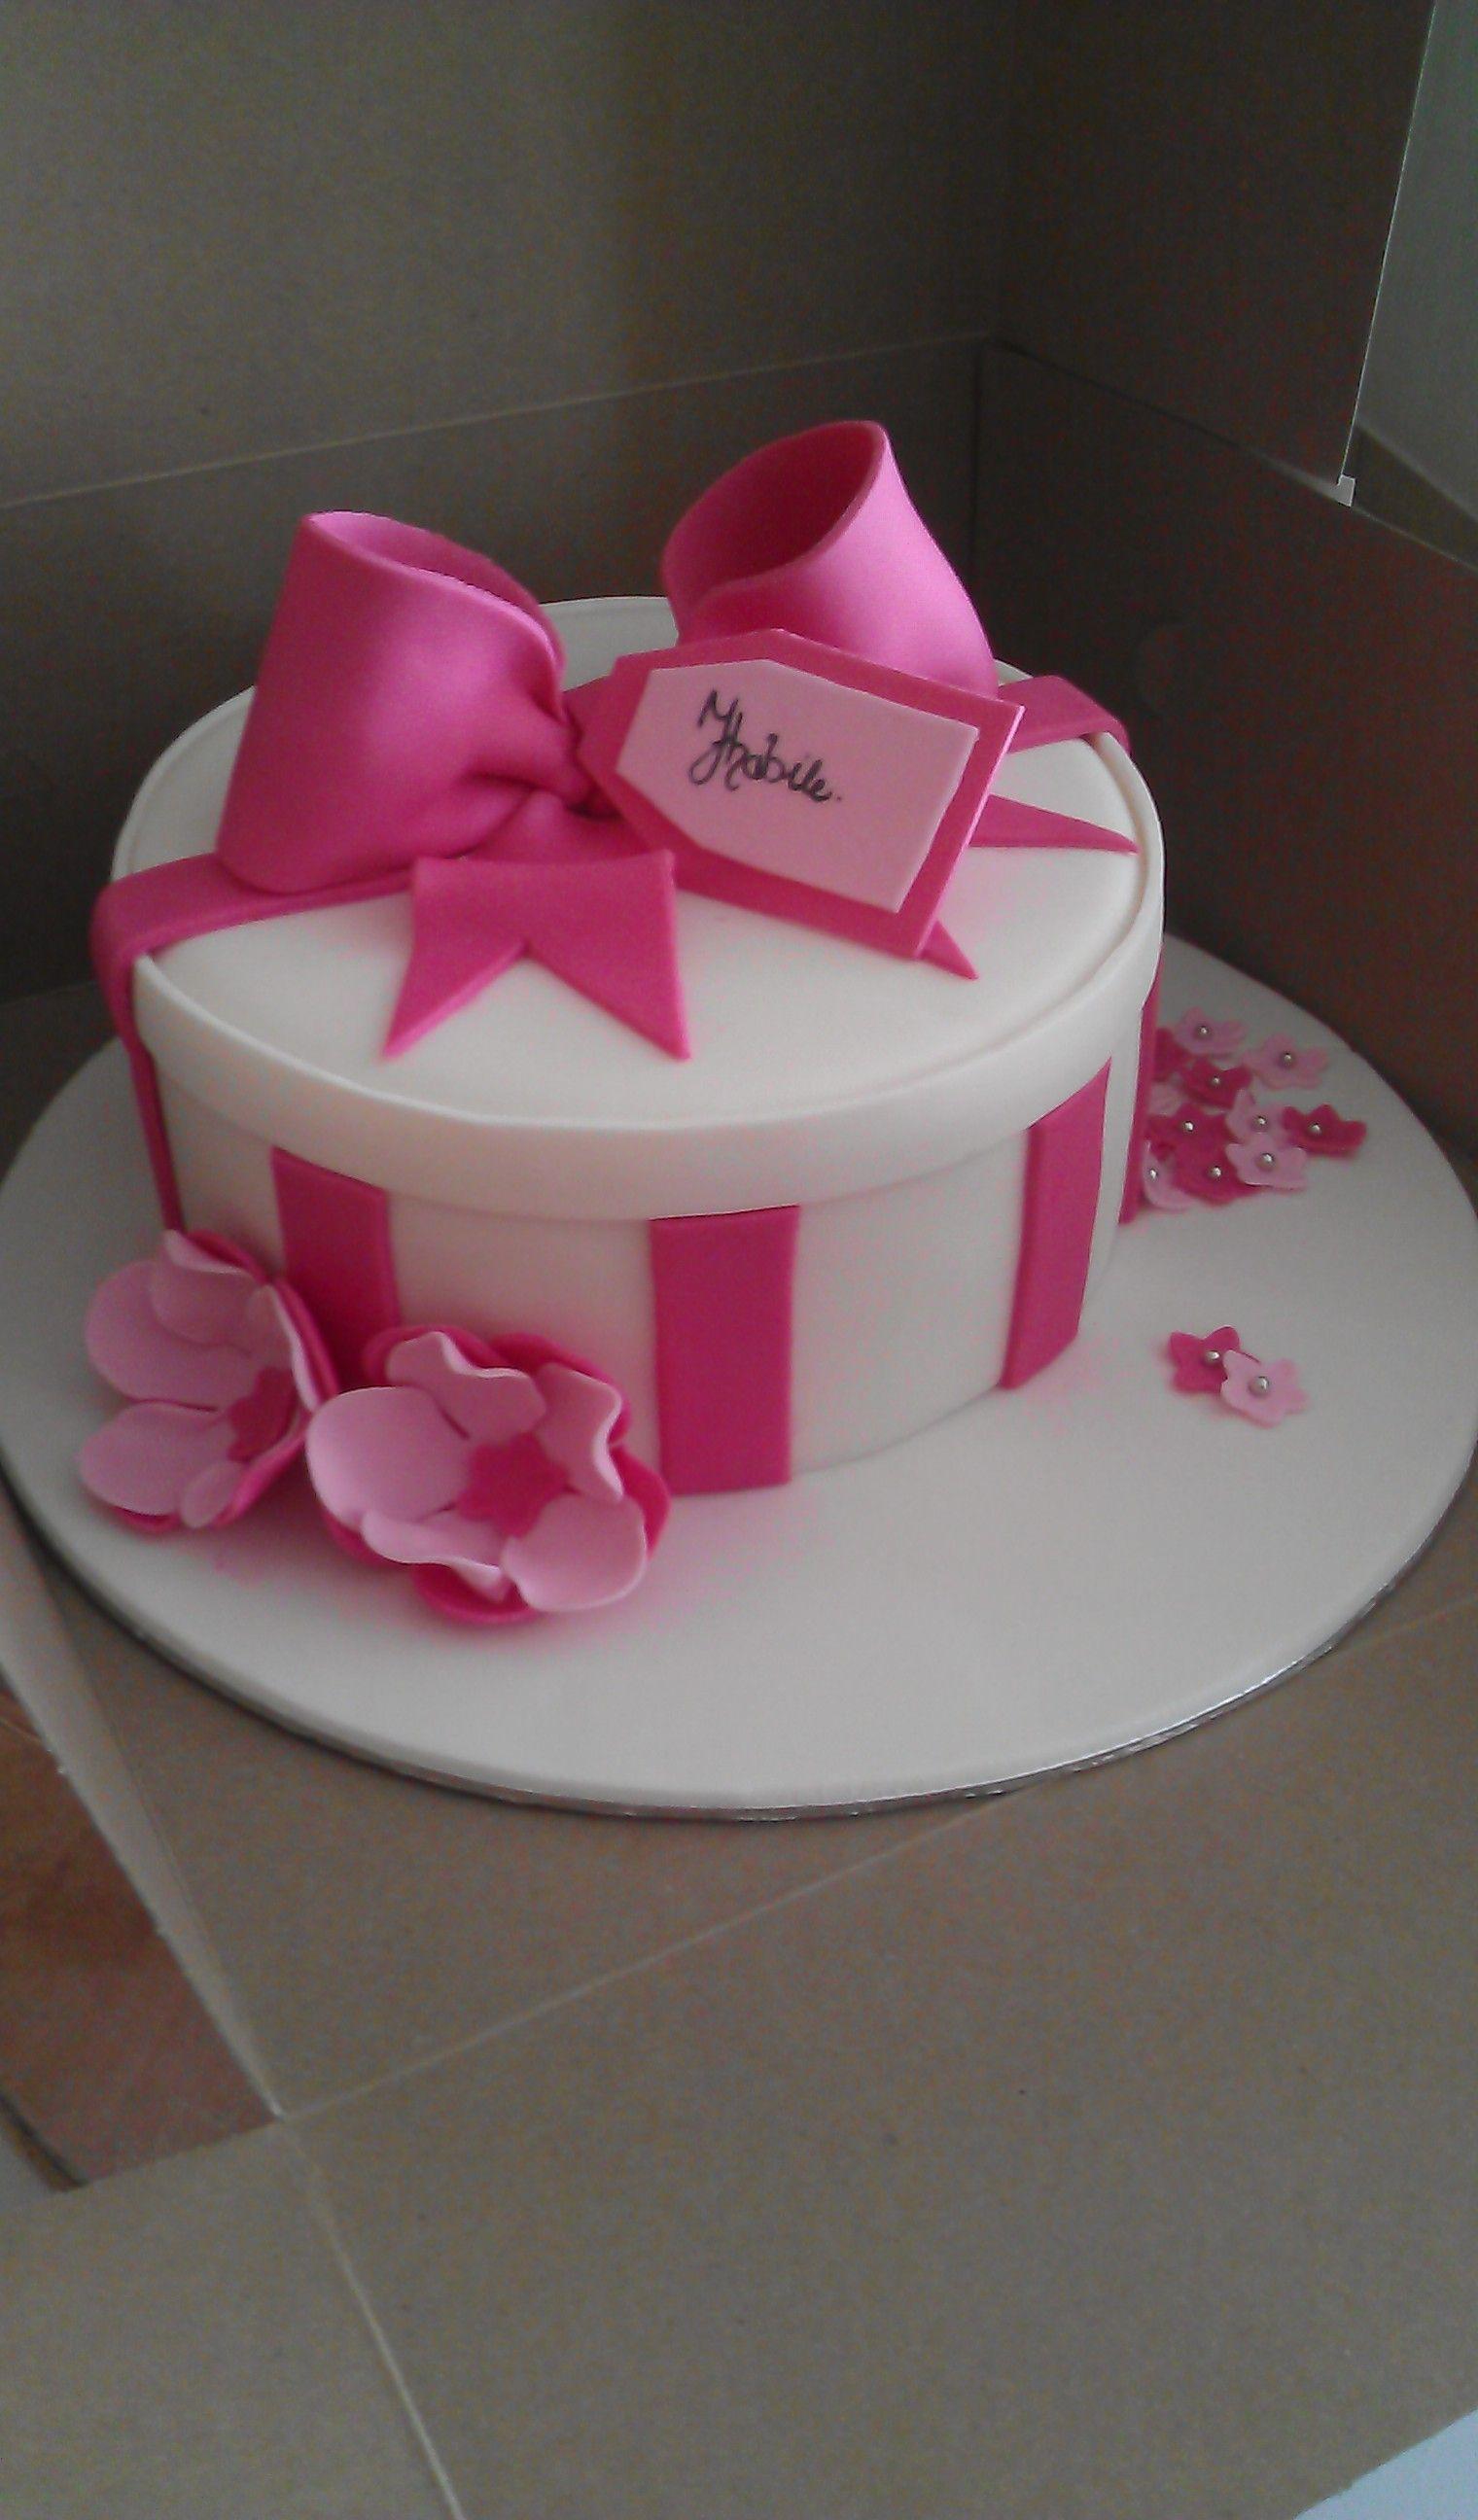 Cakes Www Carolnzama Wix Com Carolthecakelady Gift Box Cakes Birthday Cakes For Women Cake Designs Birthday